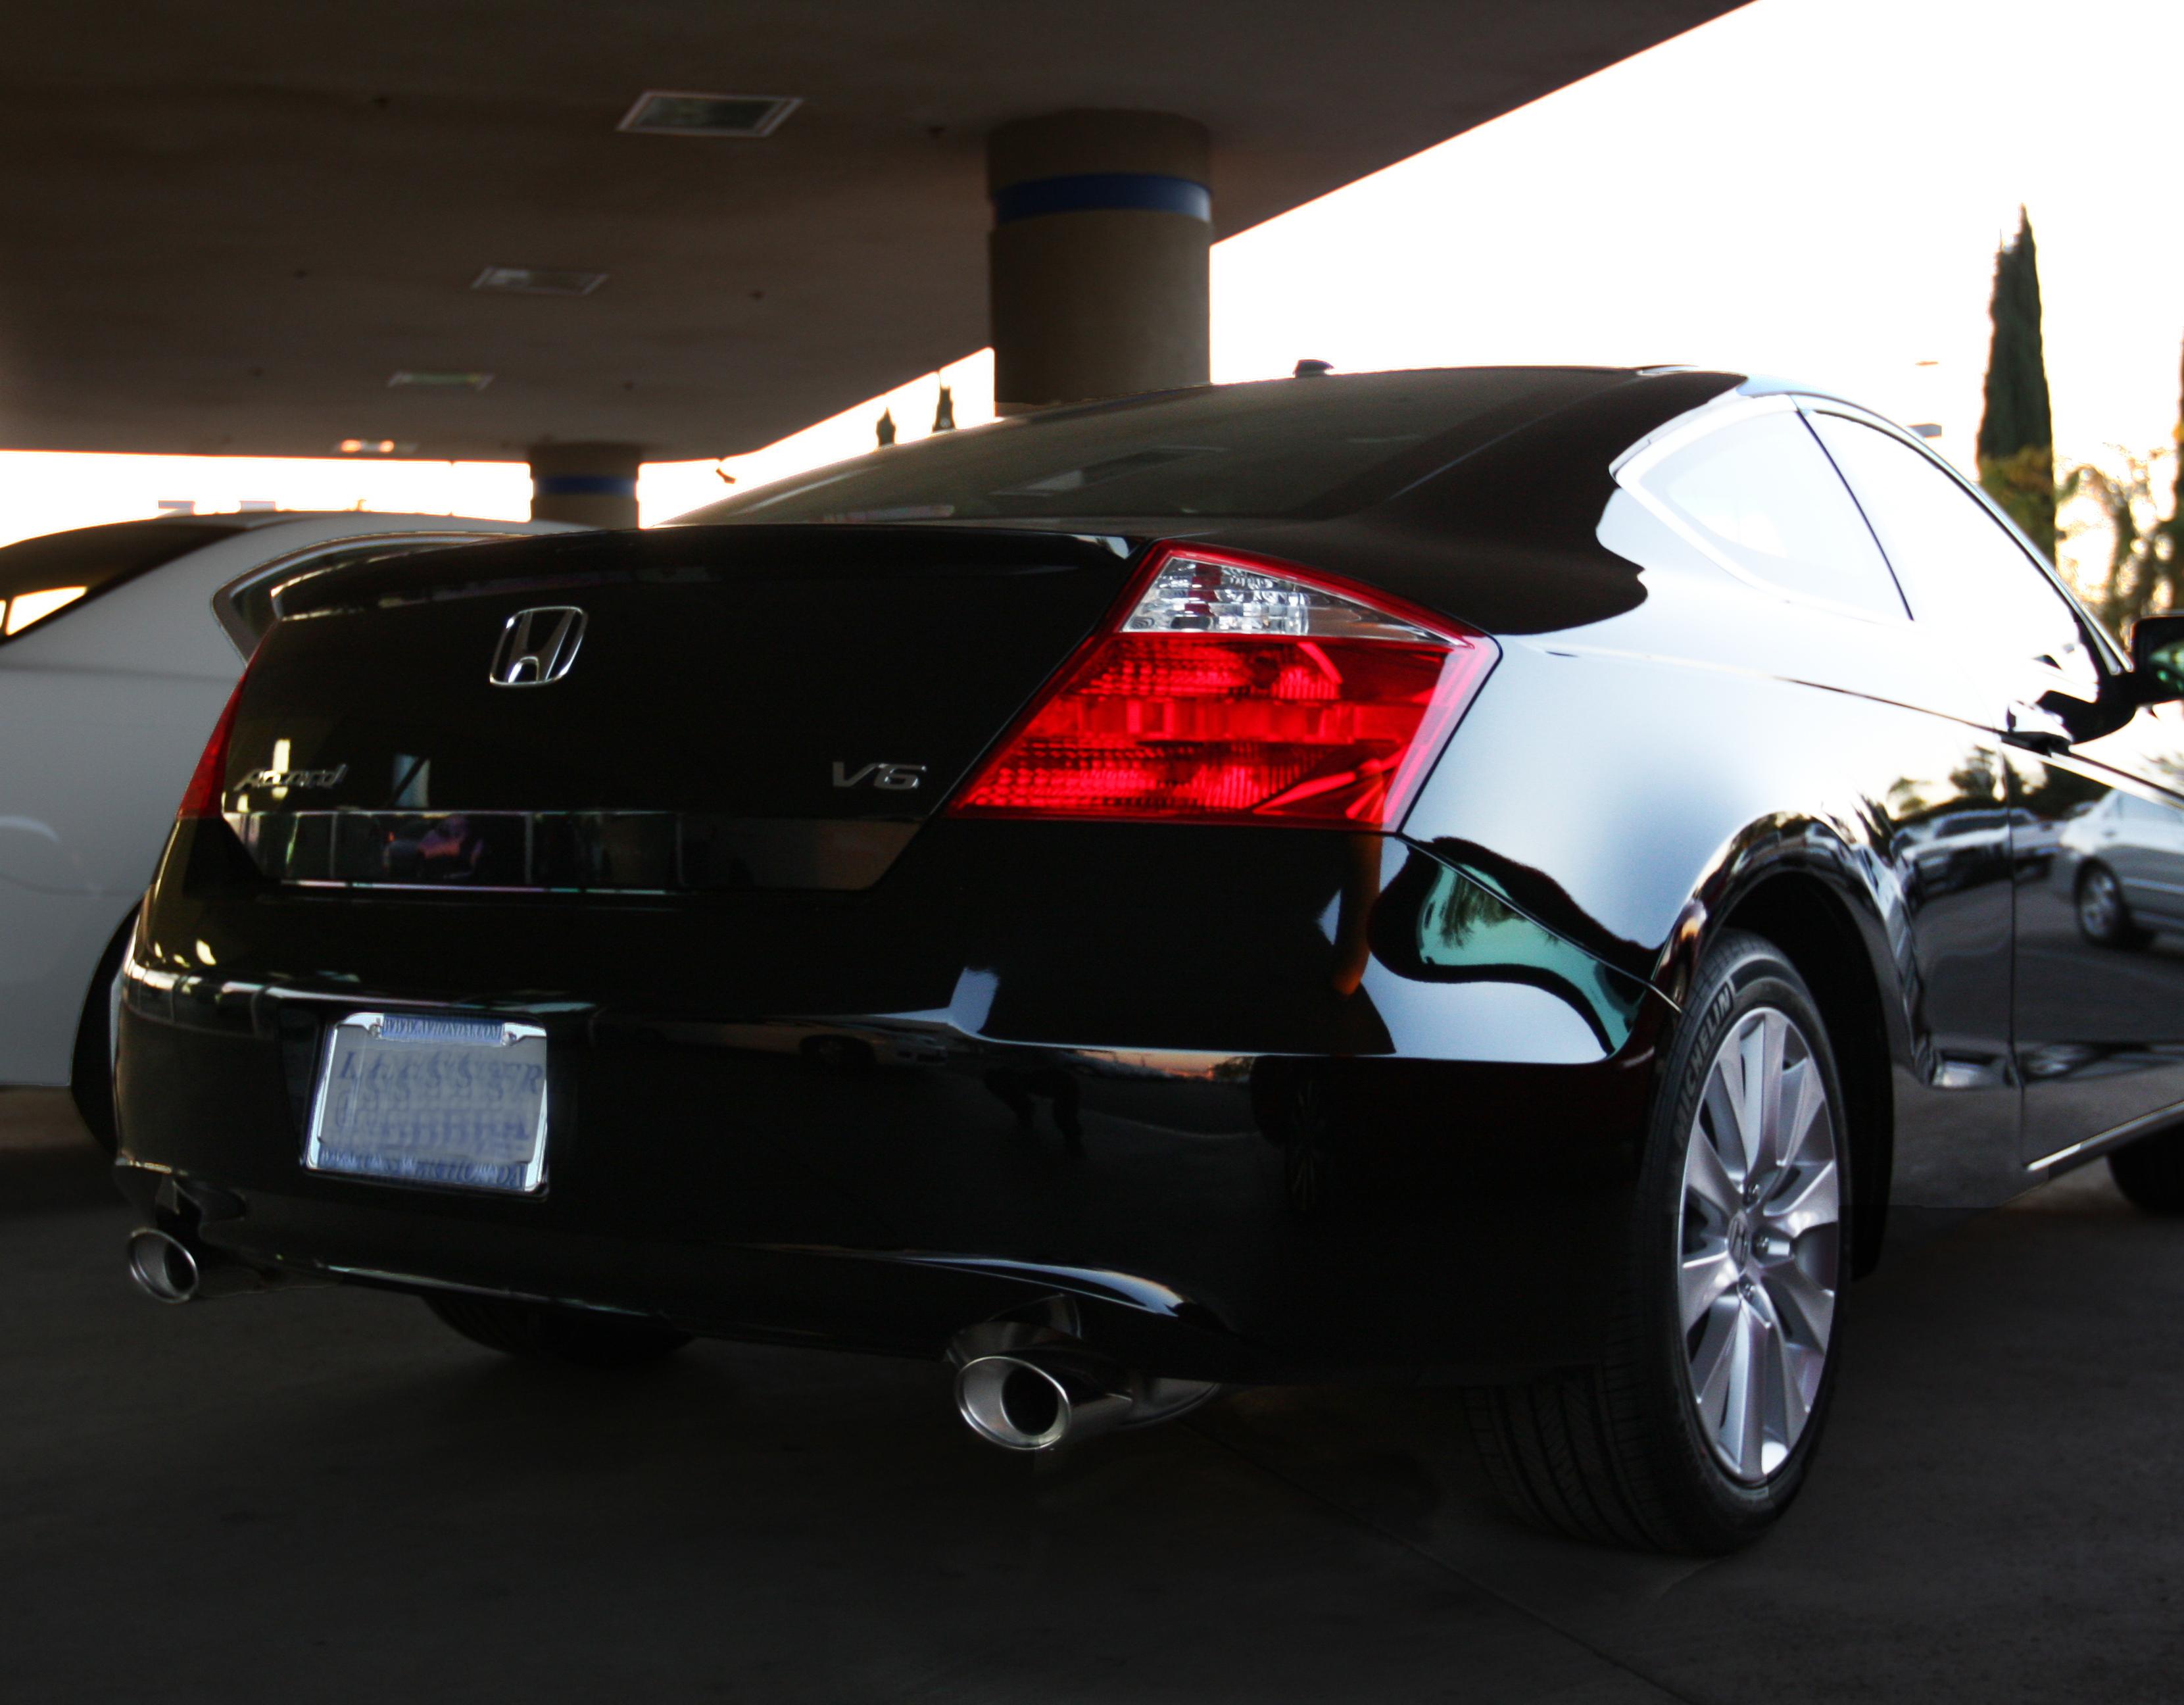 File:2010 Honda Accord Coupe (3976650487).jpg - Wikimedia Commons